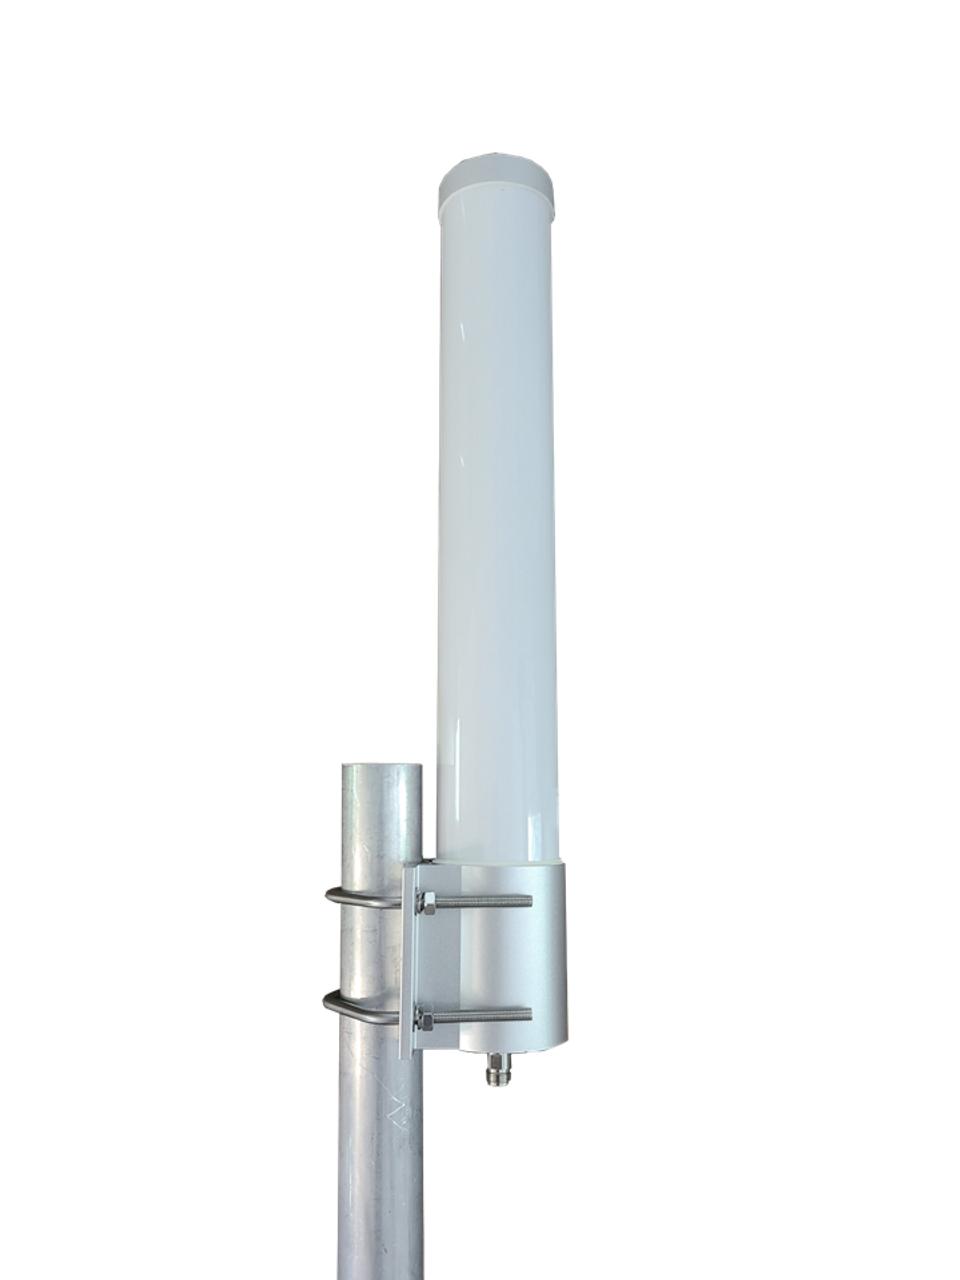 M25T T-Mobile Omni Directional Fiberglass Cellular 4G LTE 5G NR Band 71 External Data M2M IoT Antenna - Pole Mount (Bracket Mount Hardware Included)